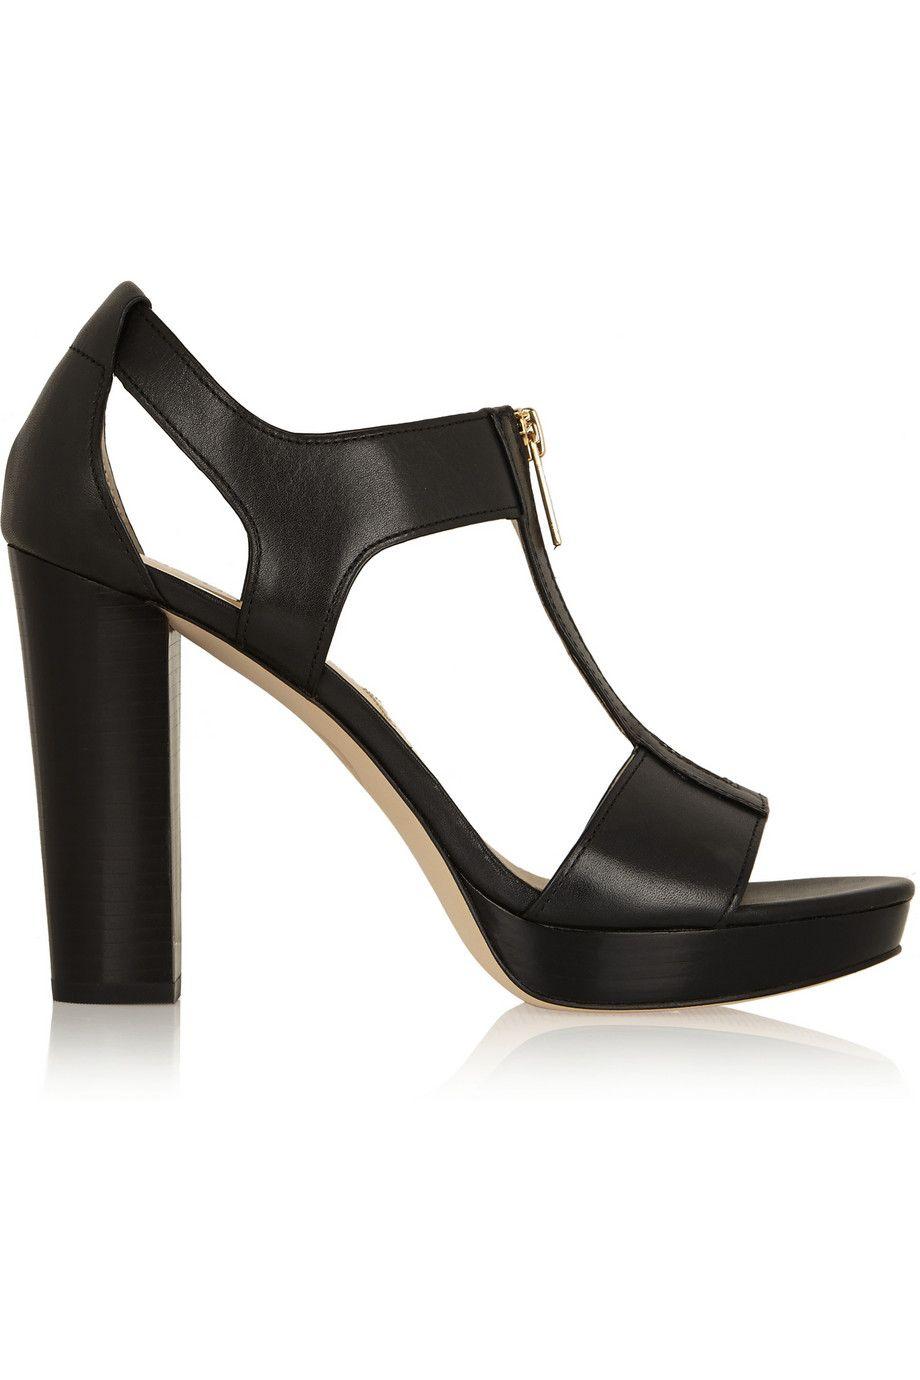 MICHAEL Michael Kors|Berkeley leather sandals|NET-A-PORTER.COM